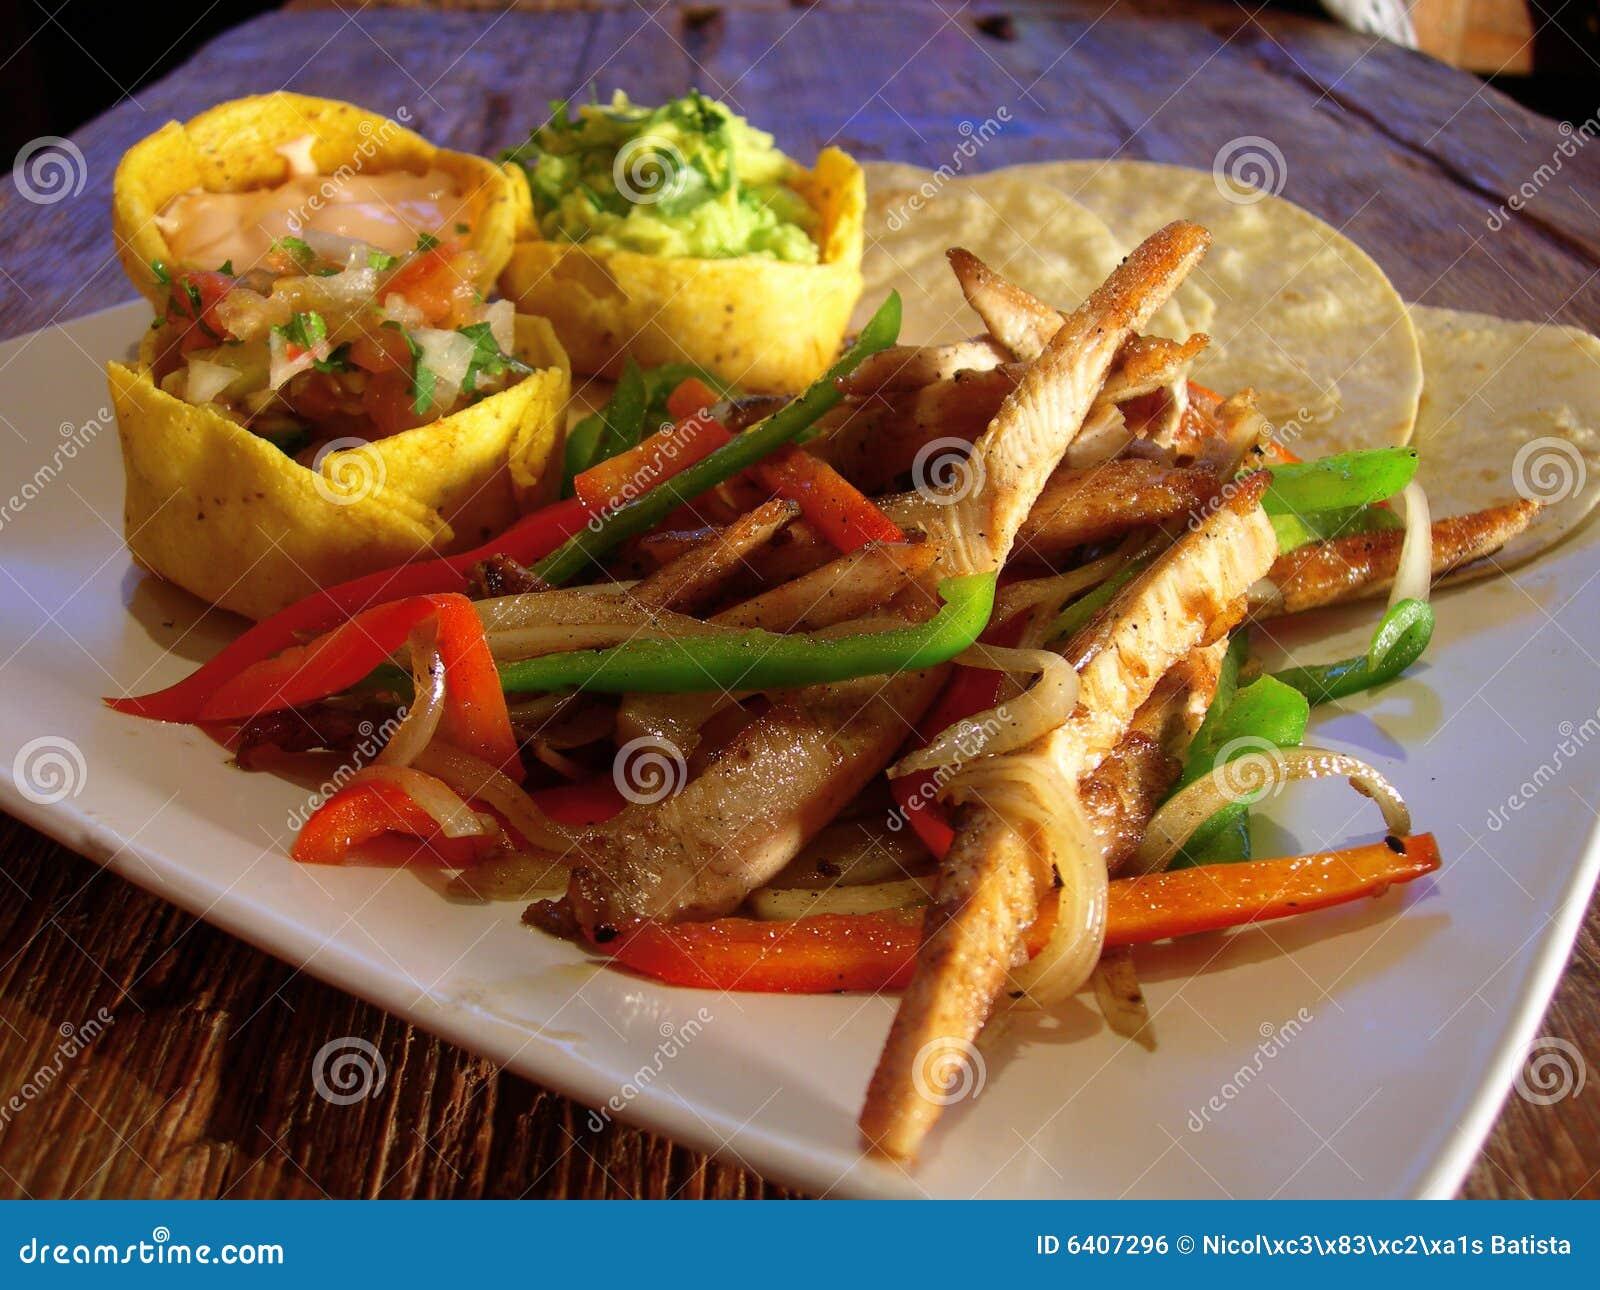 Mexican chicken fajitas